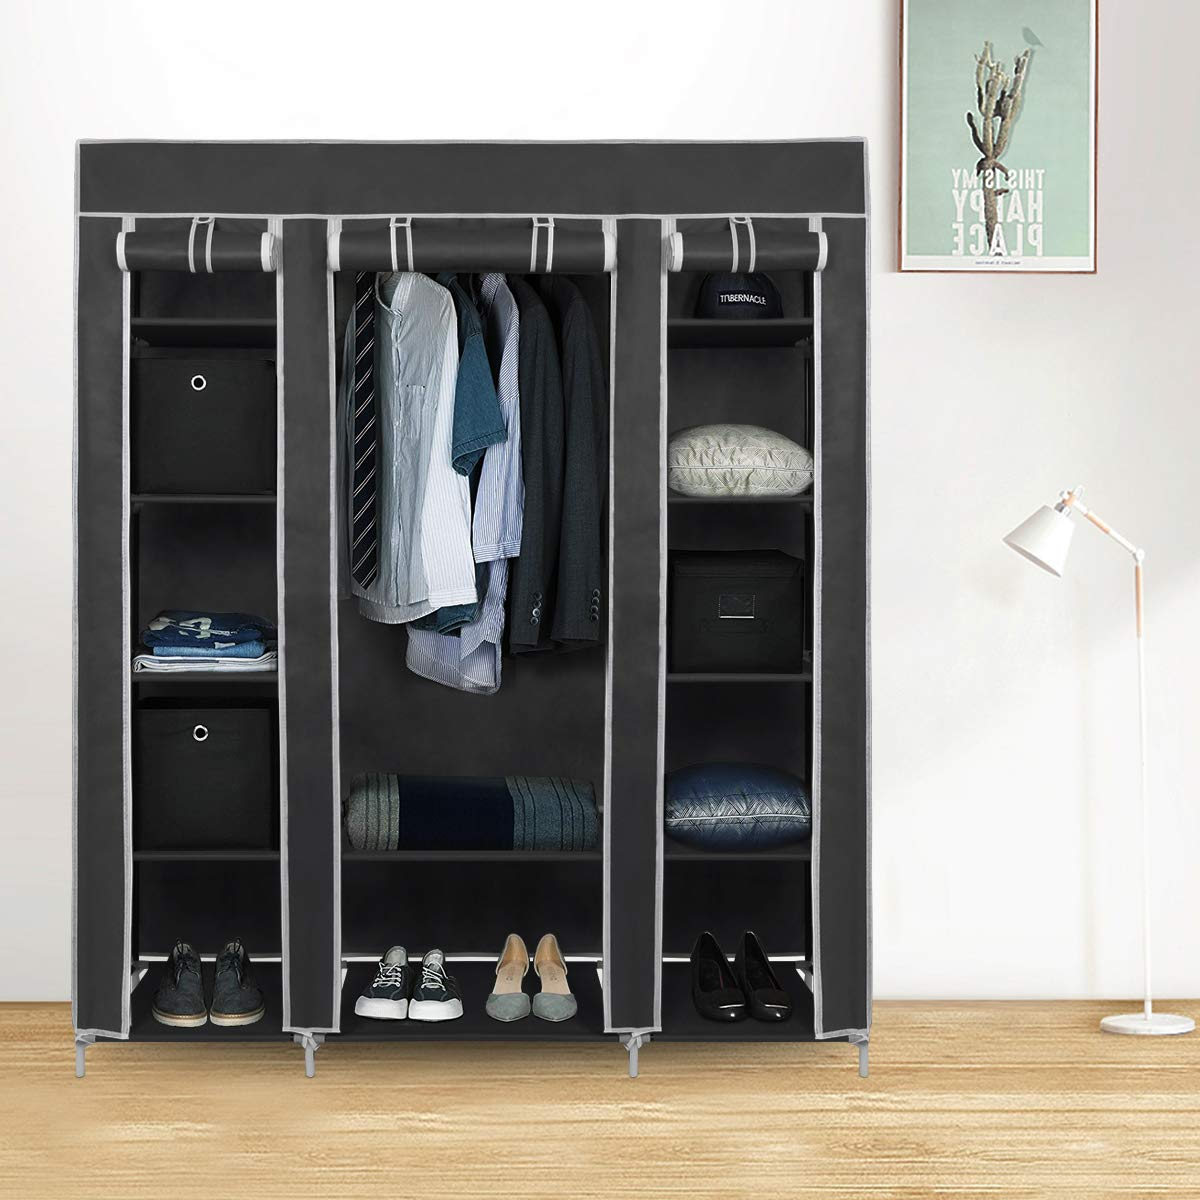 LEMAIJIAJU Canvas Wardrobe Non-Woven Fabric Wardrobe Bedroom Furniture Storage Cupboard for Clothes Hanging Rail Storage Shelves Grey